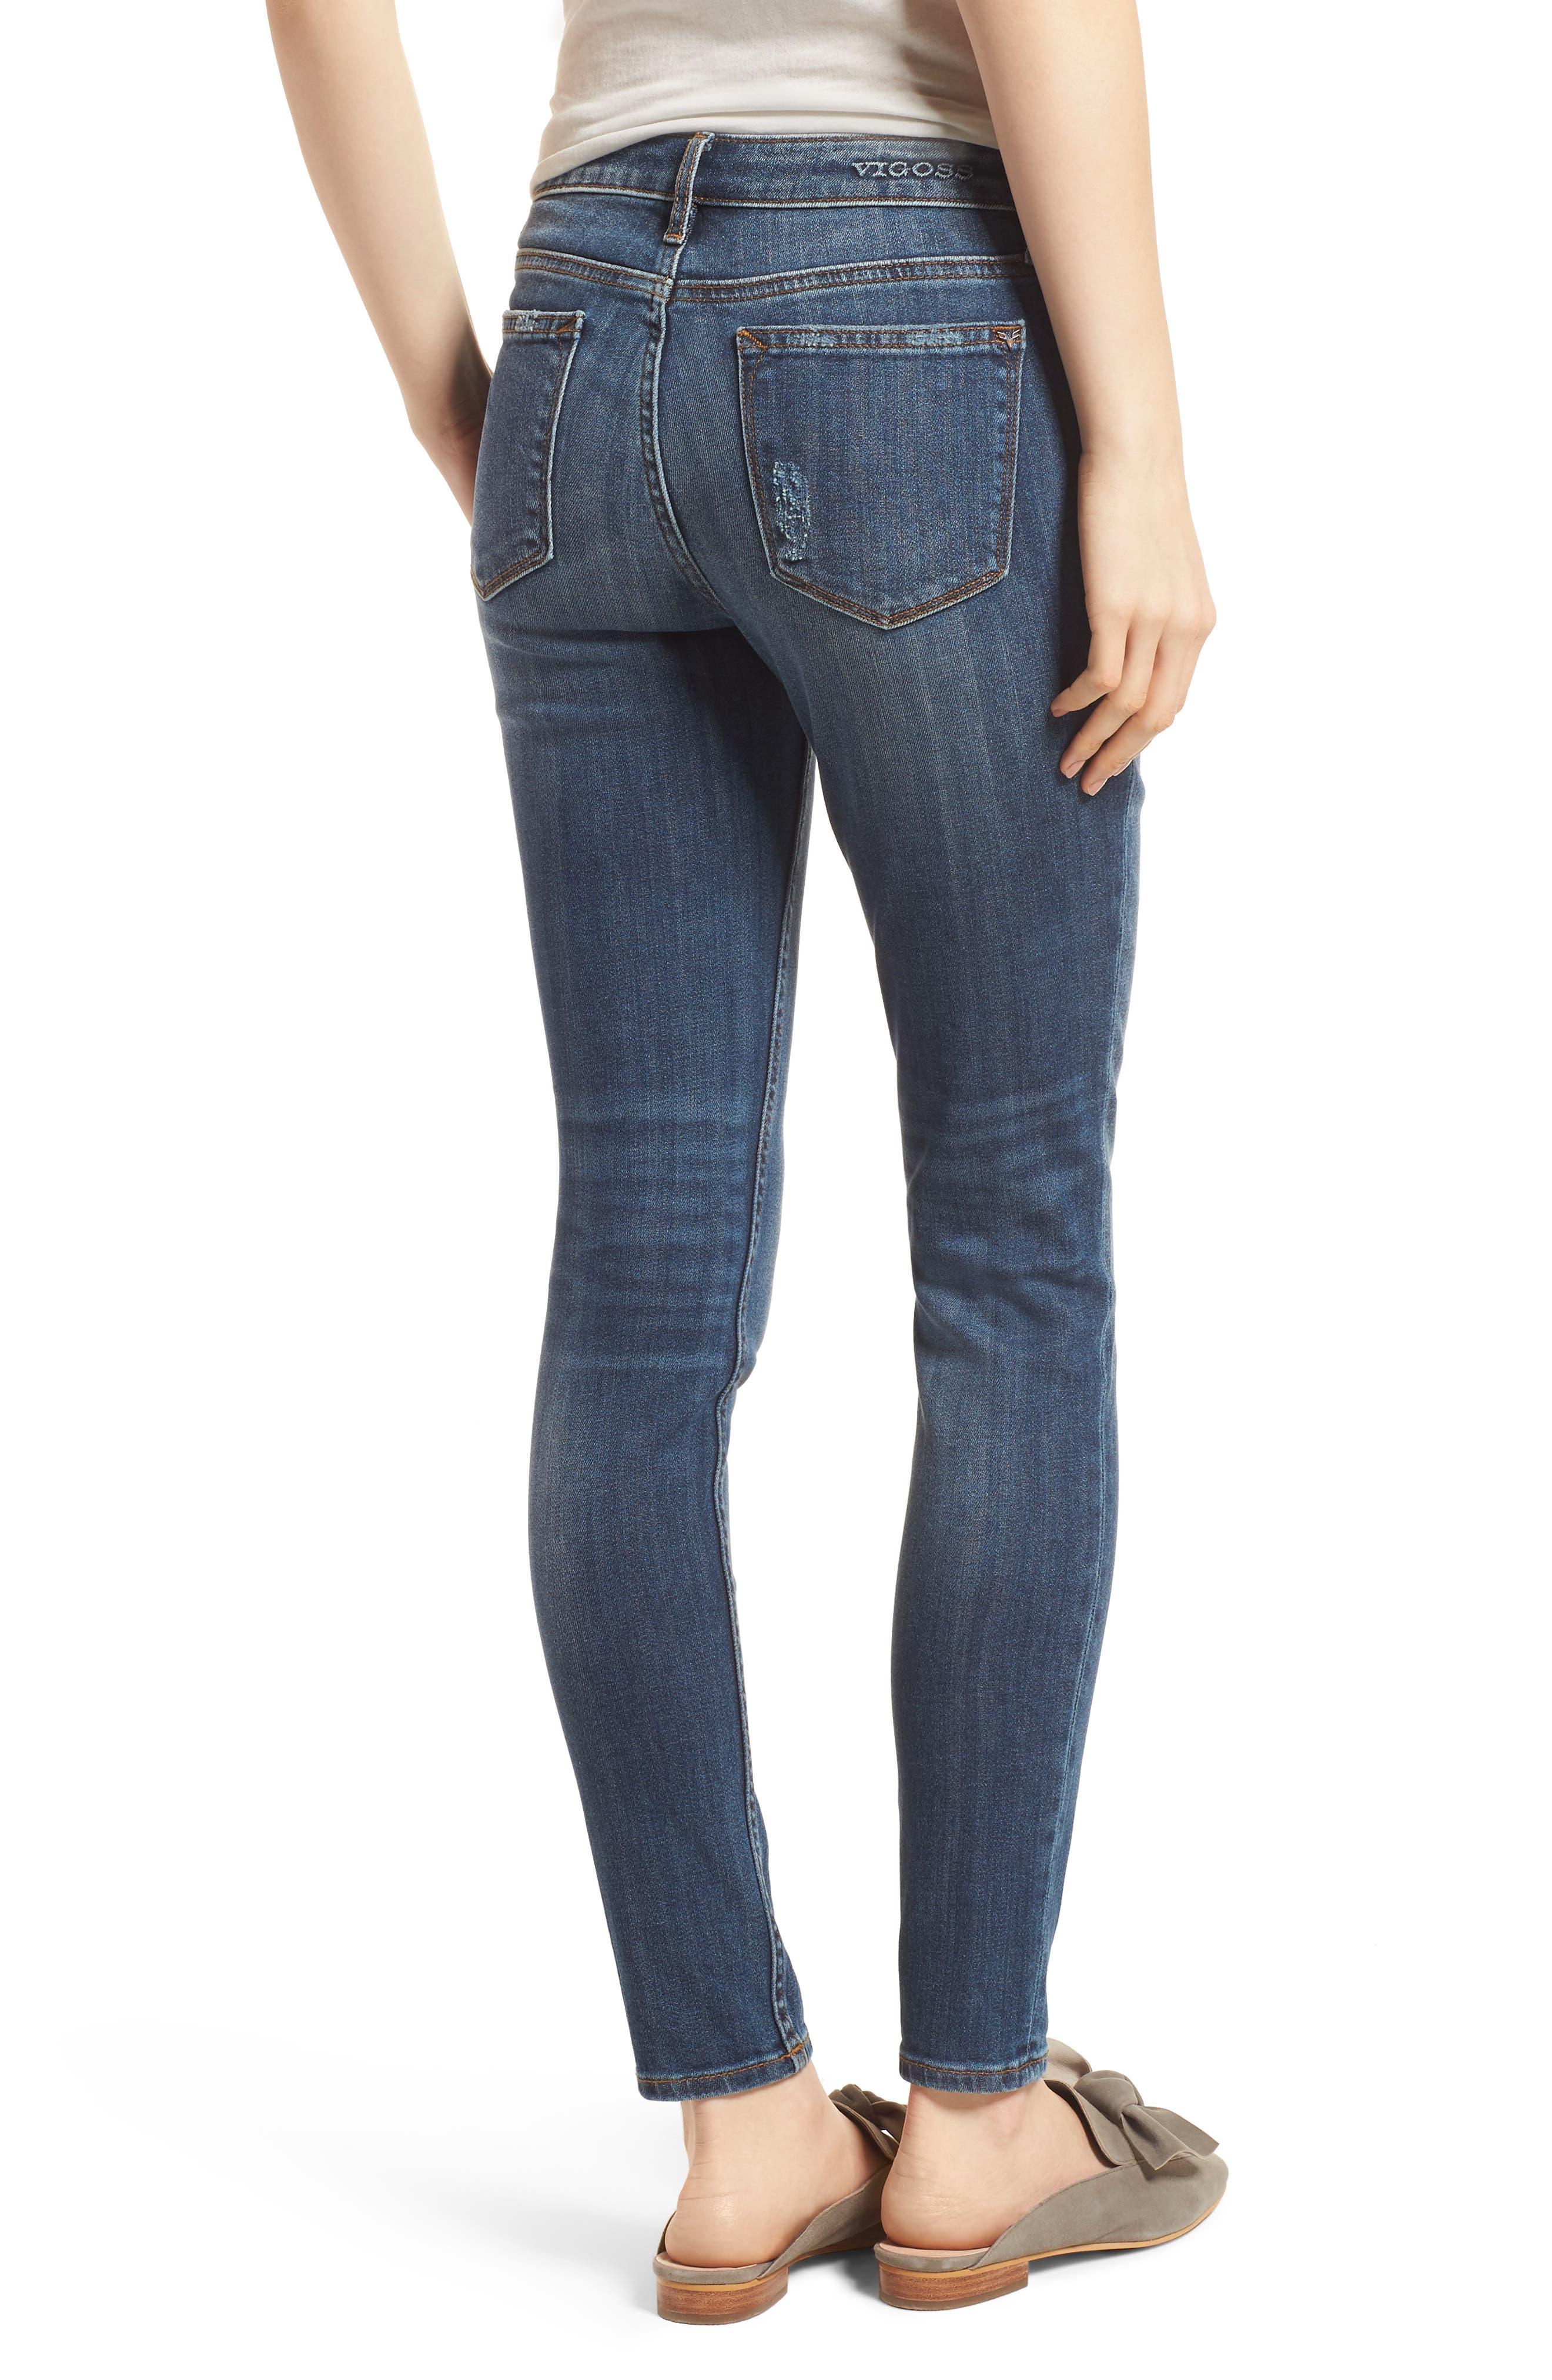 Jagger Skinny Jeans,                             Alternate thumbnail 2, color,                             Medium Wash